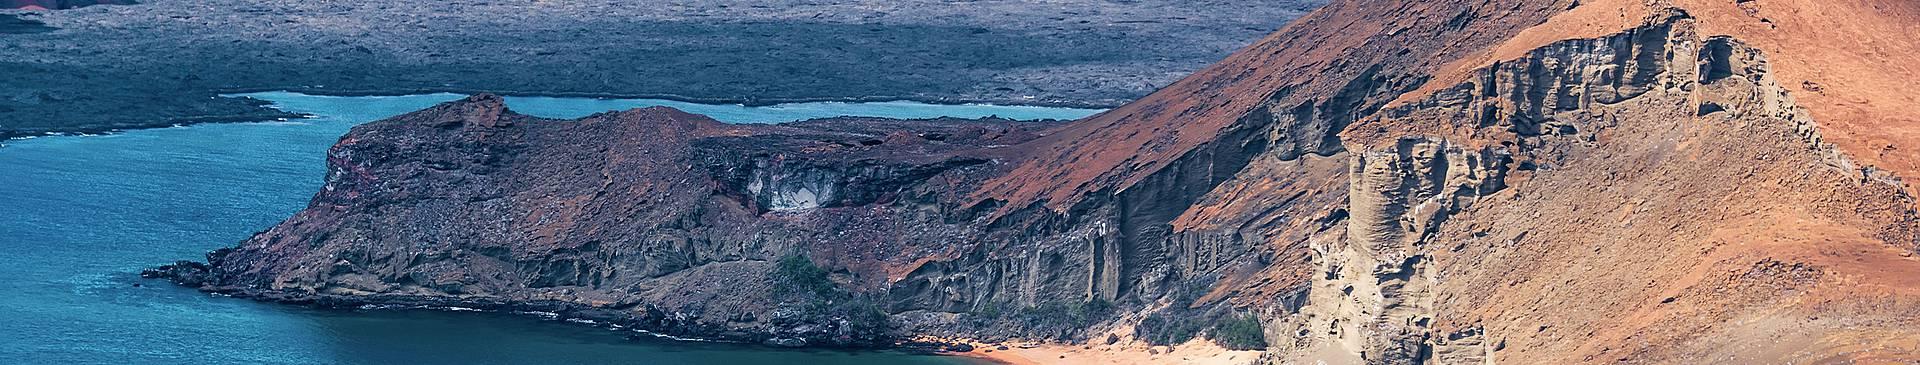 Naturreisen Galapagos Inseln